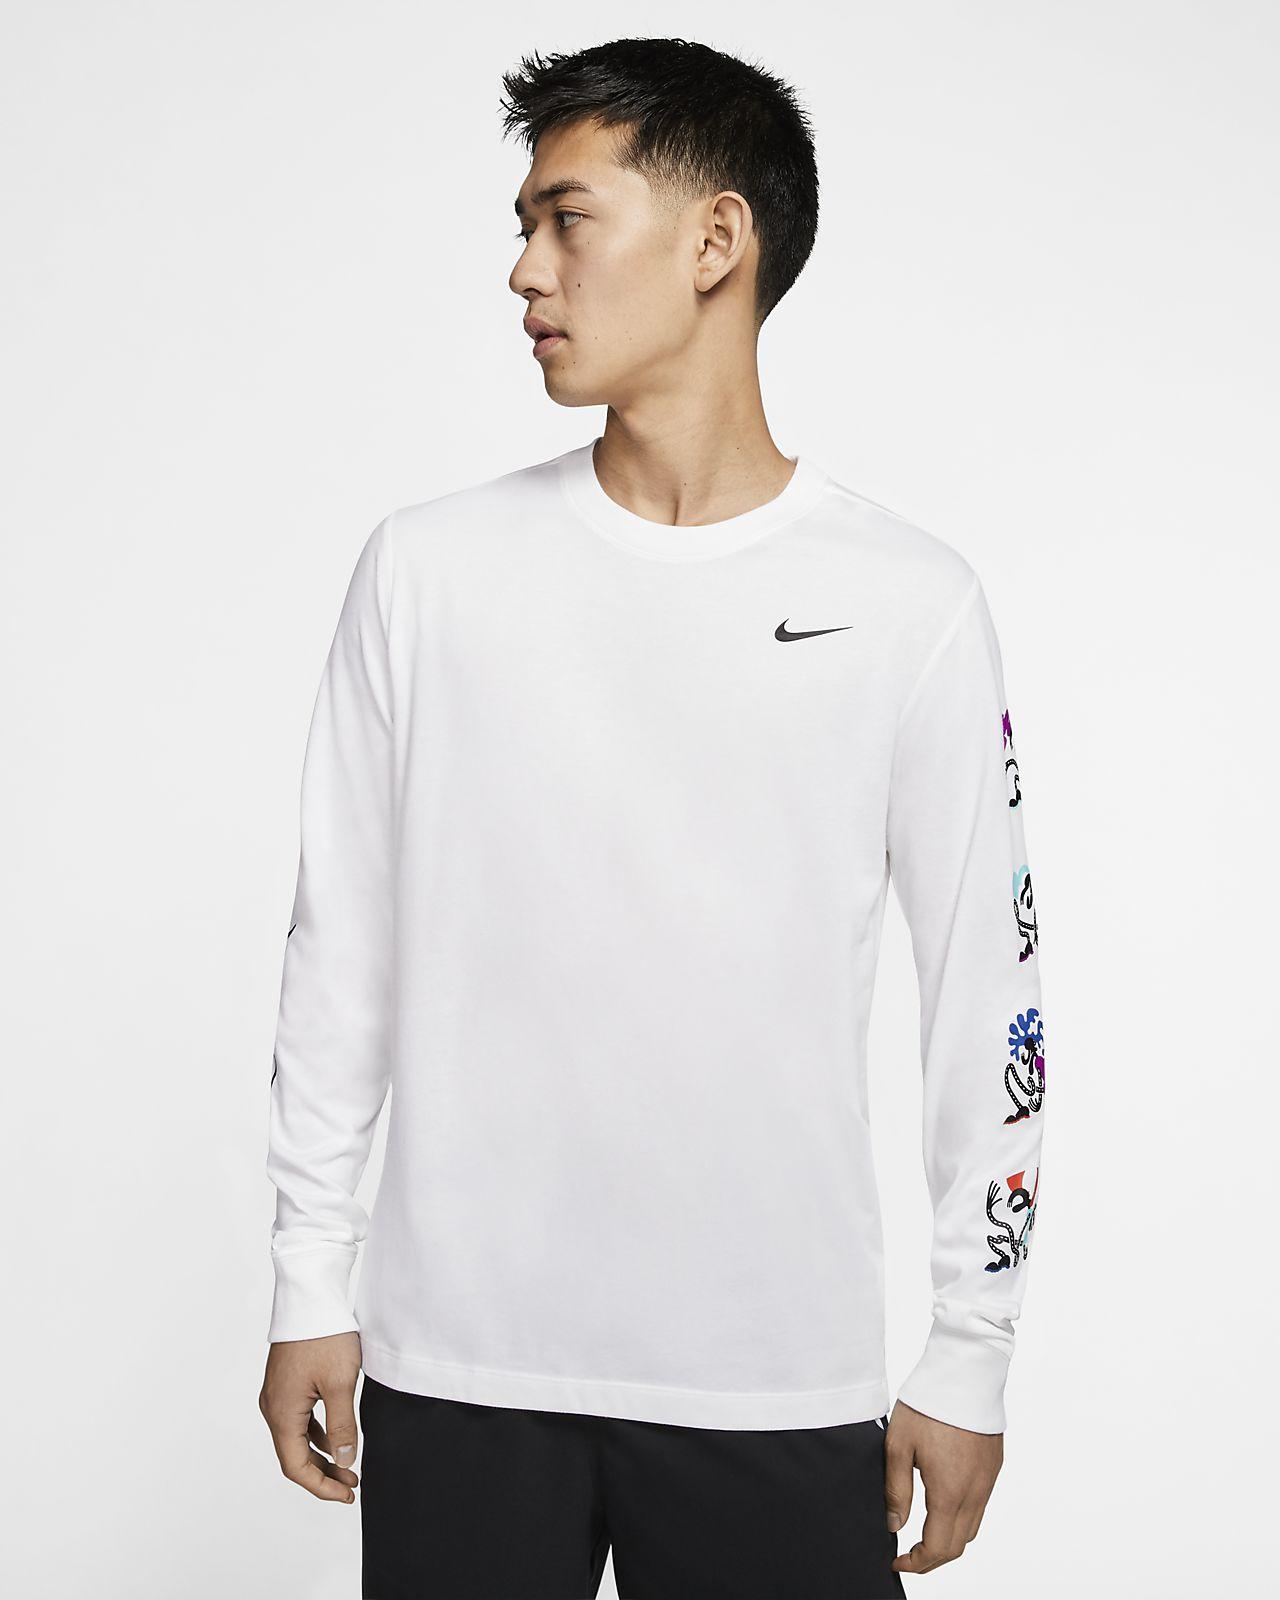 Nike Dri-FIT Men's Long-Sleeve T-Shirt